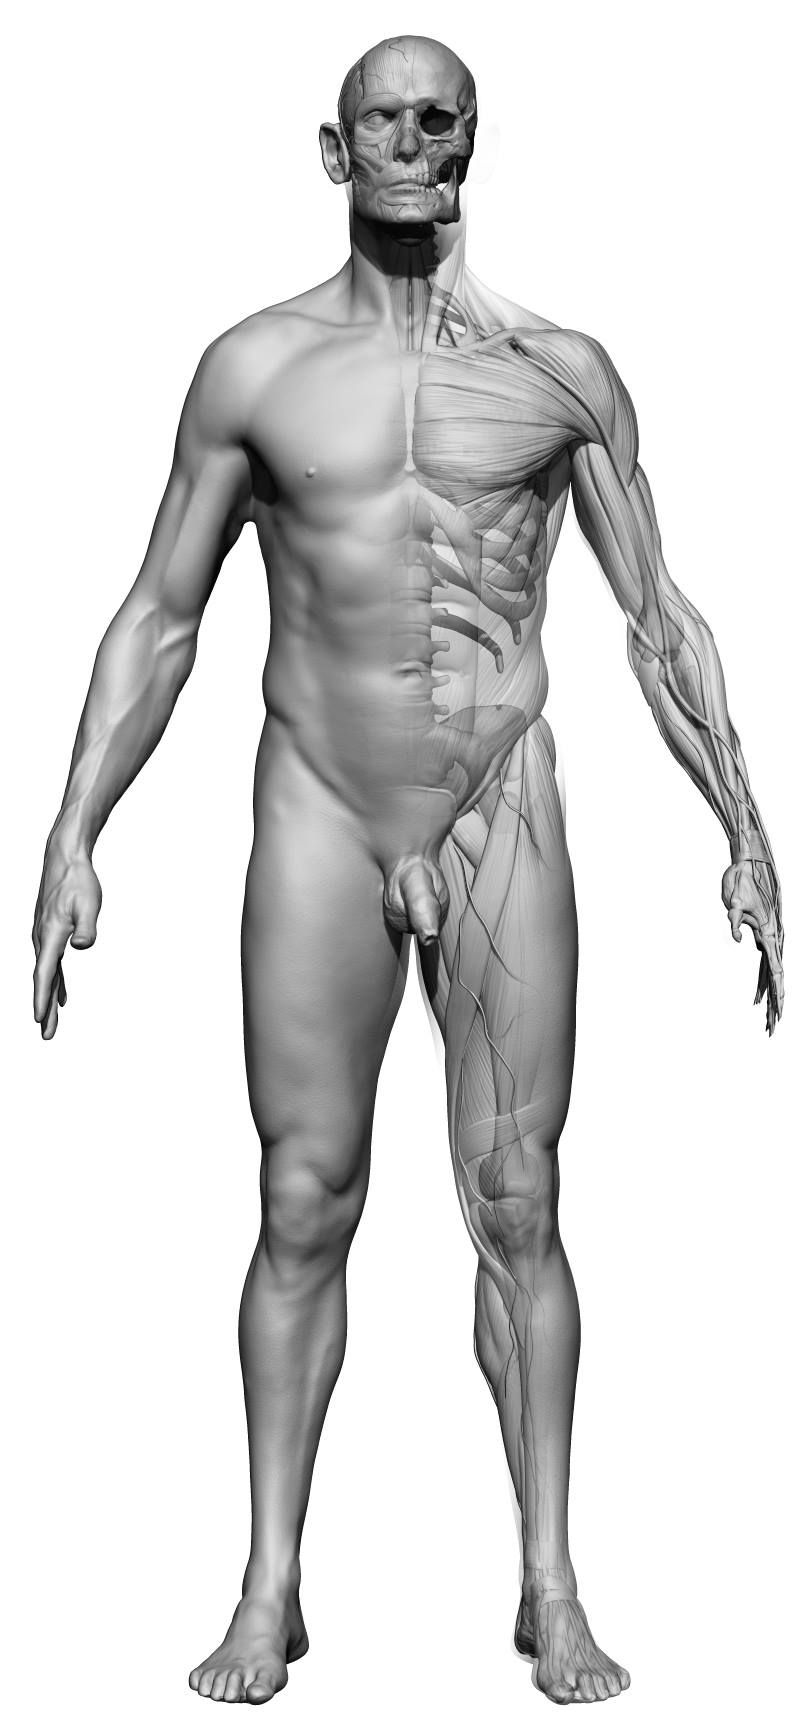 Dorable Anatomy Reference Model Photo - Anatomy Ideas - yunoki.info